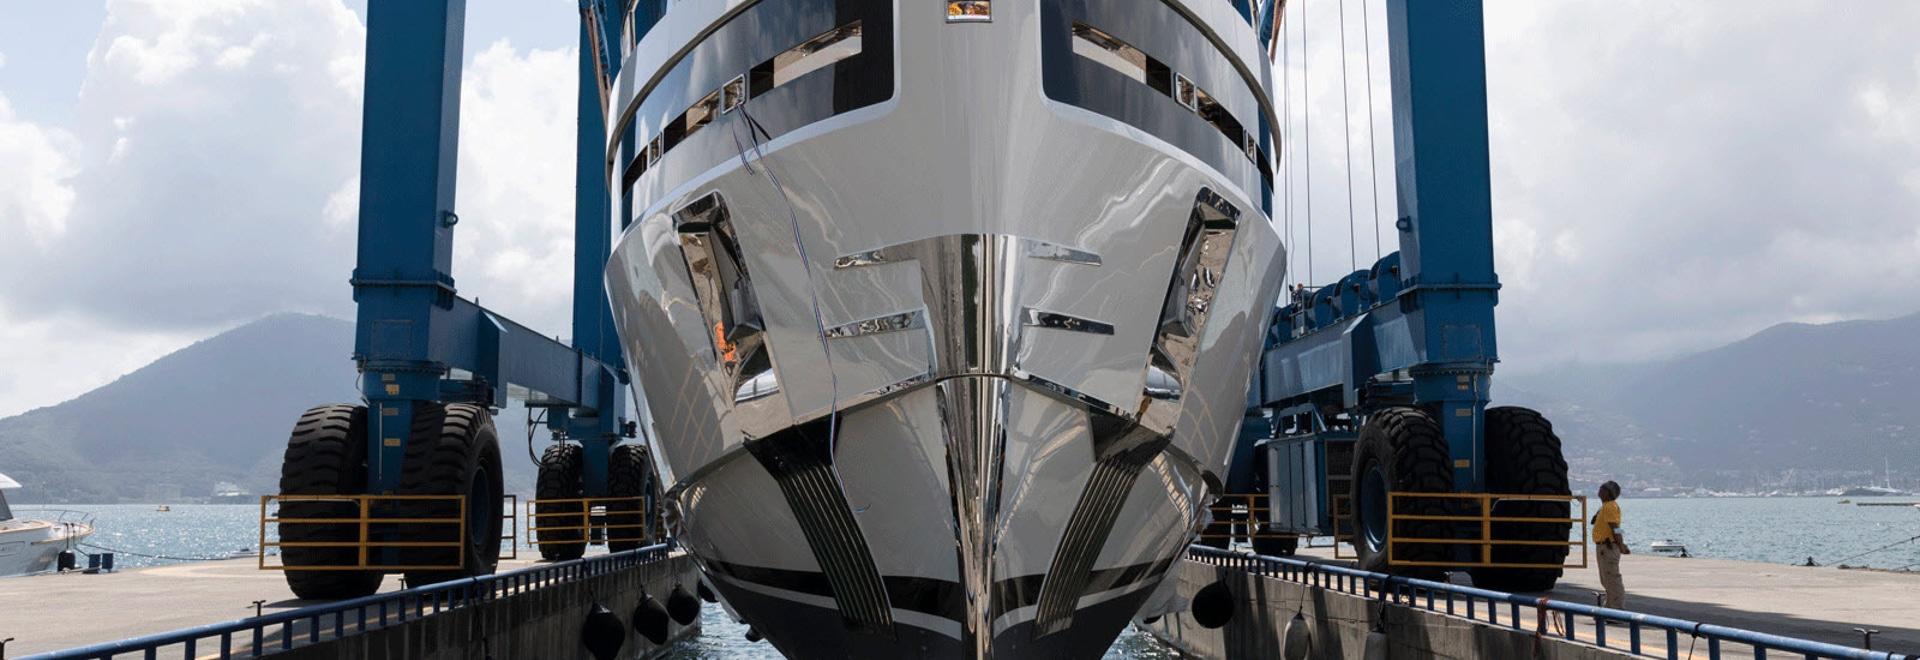 Baglietto lanciert 40-Meter-Yachtrumpf 10232